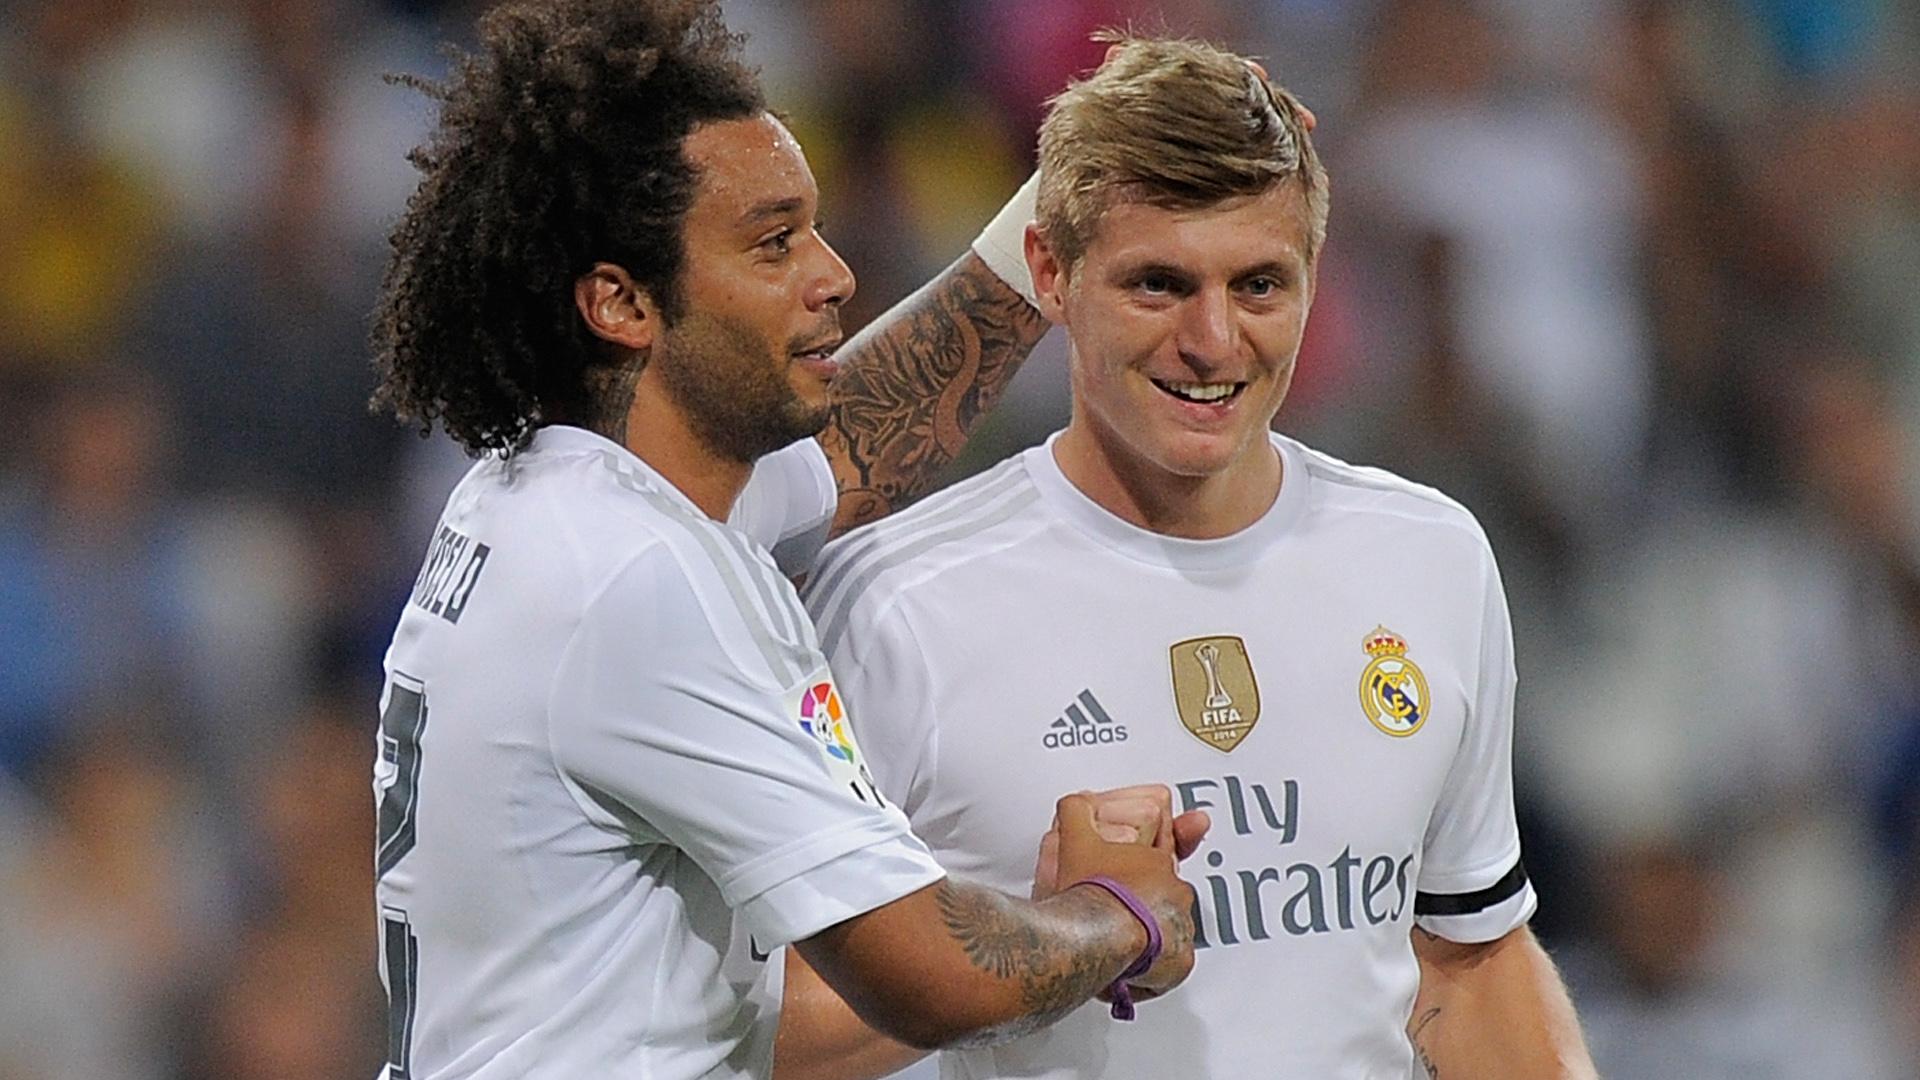 Marcelo e Kroos Real Madrid x Galatasaray 18 08 15